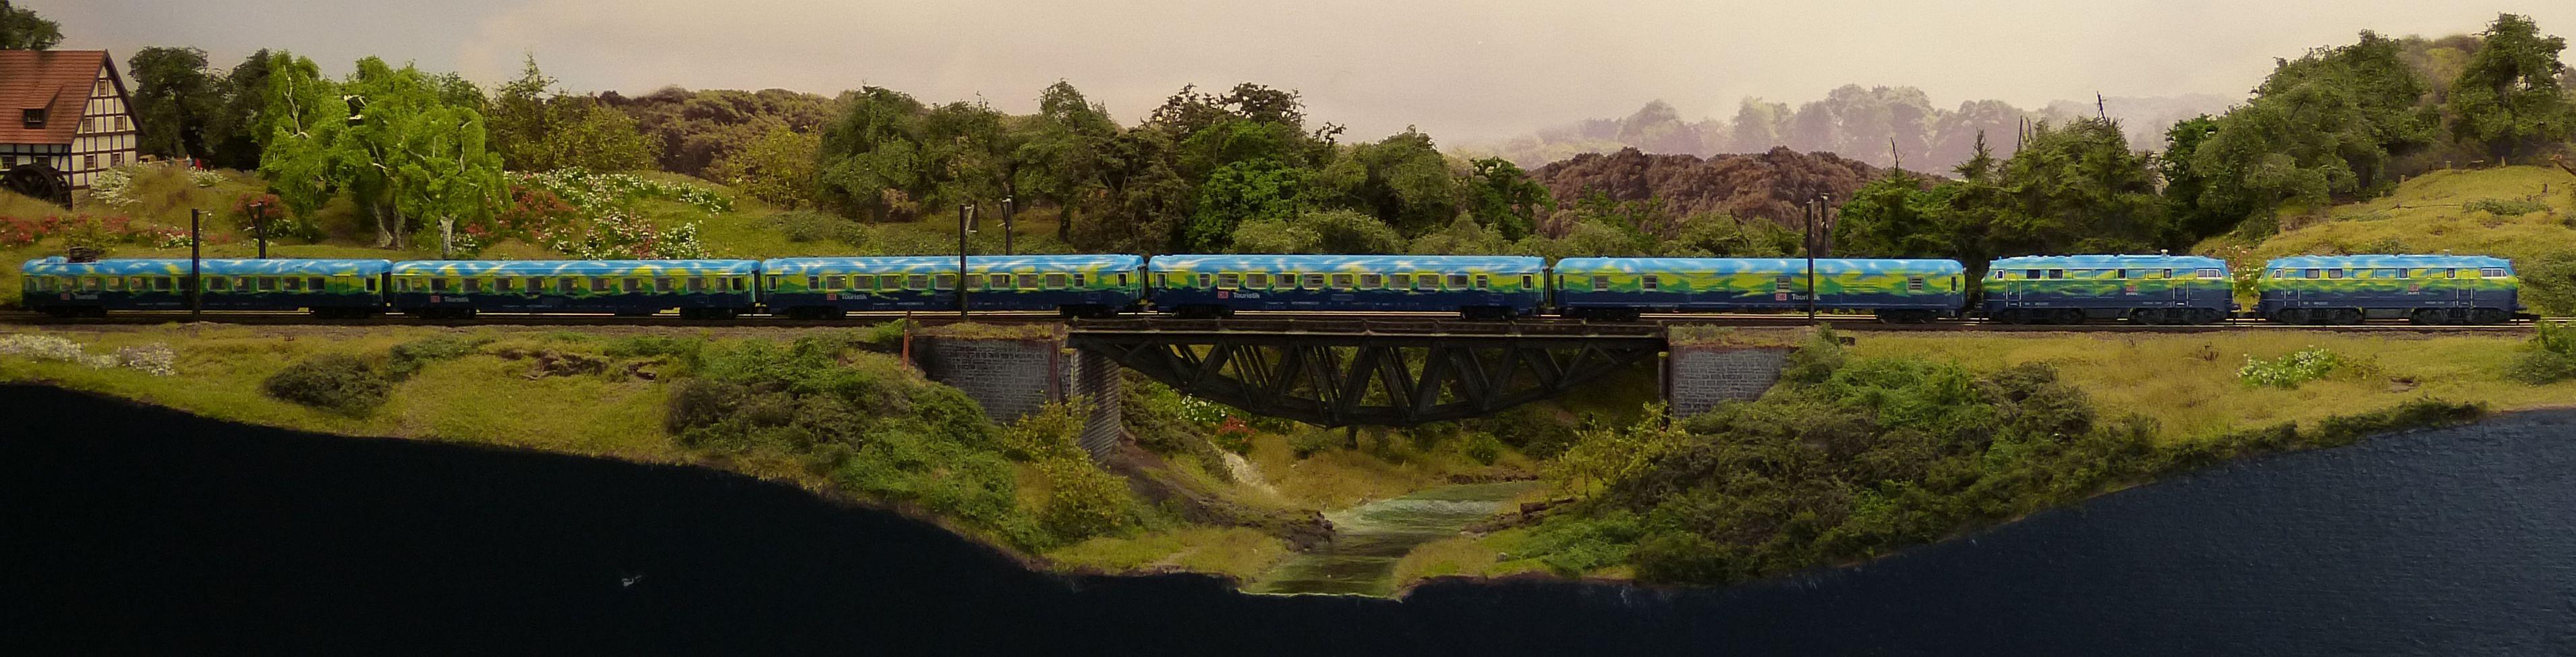 40-Touristik-Zug 2